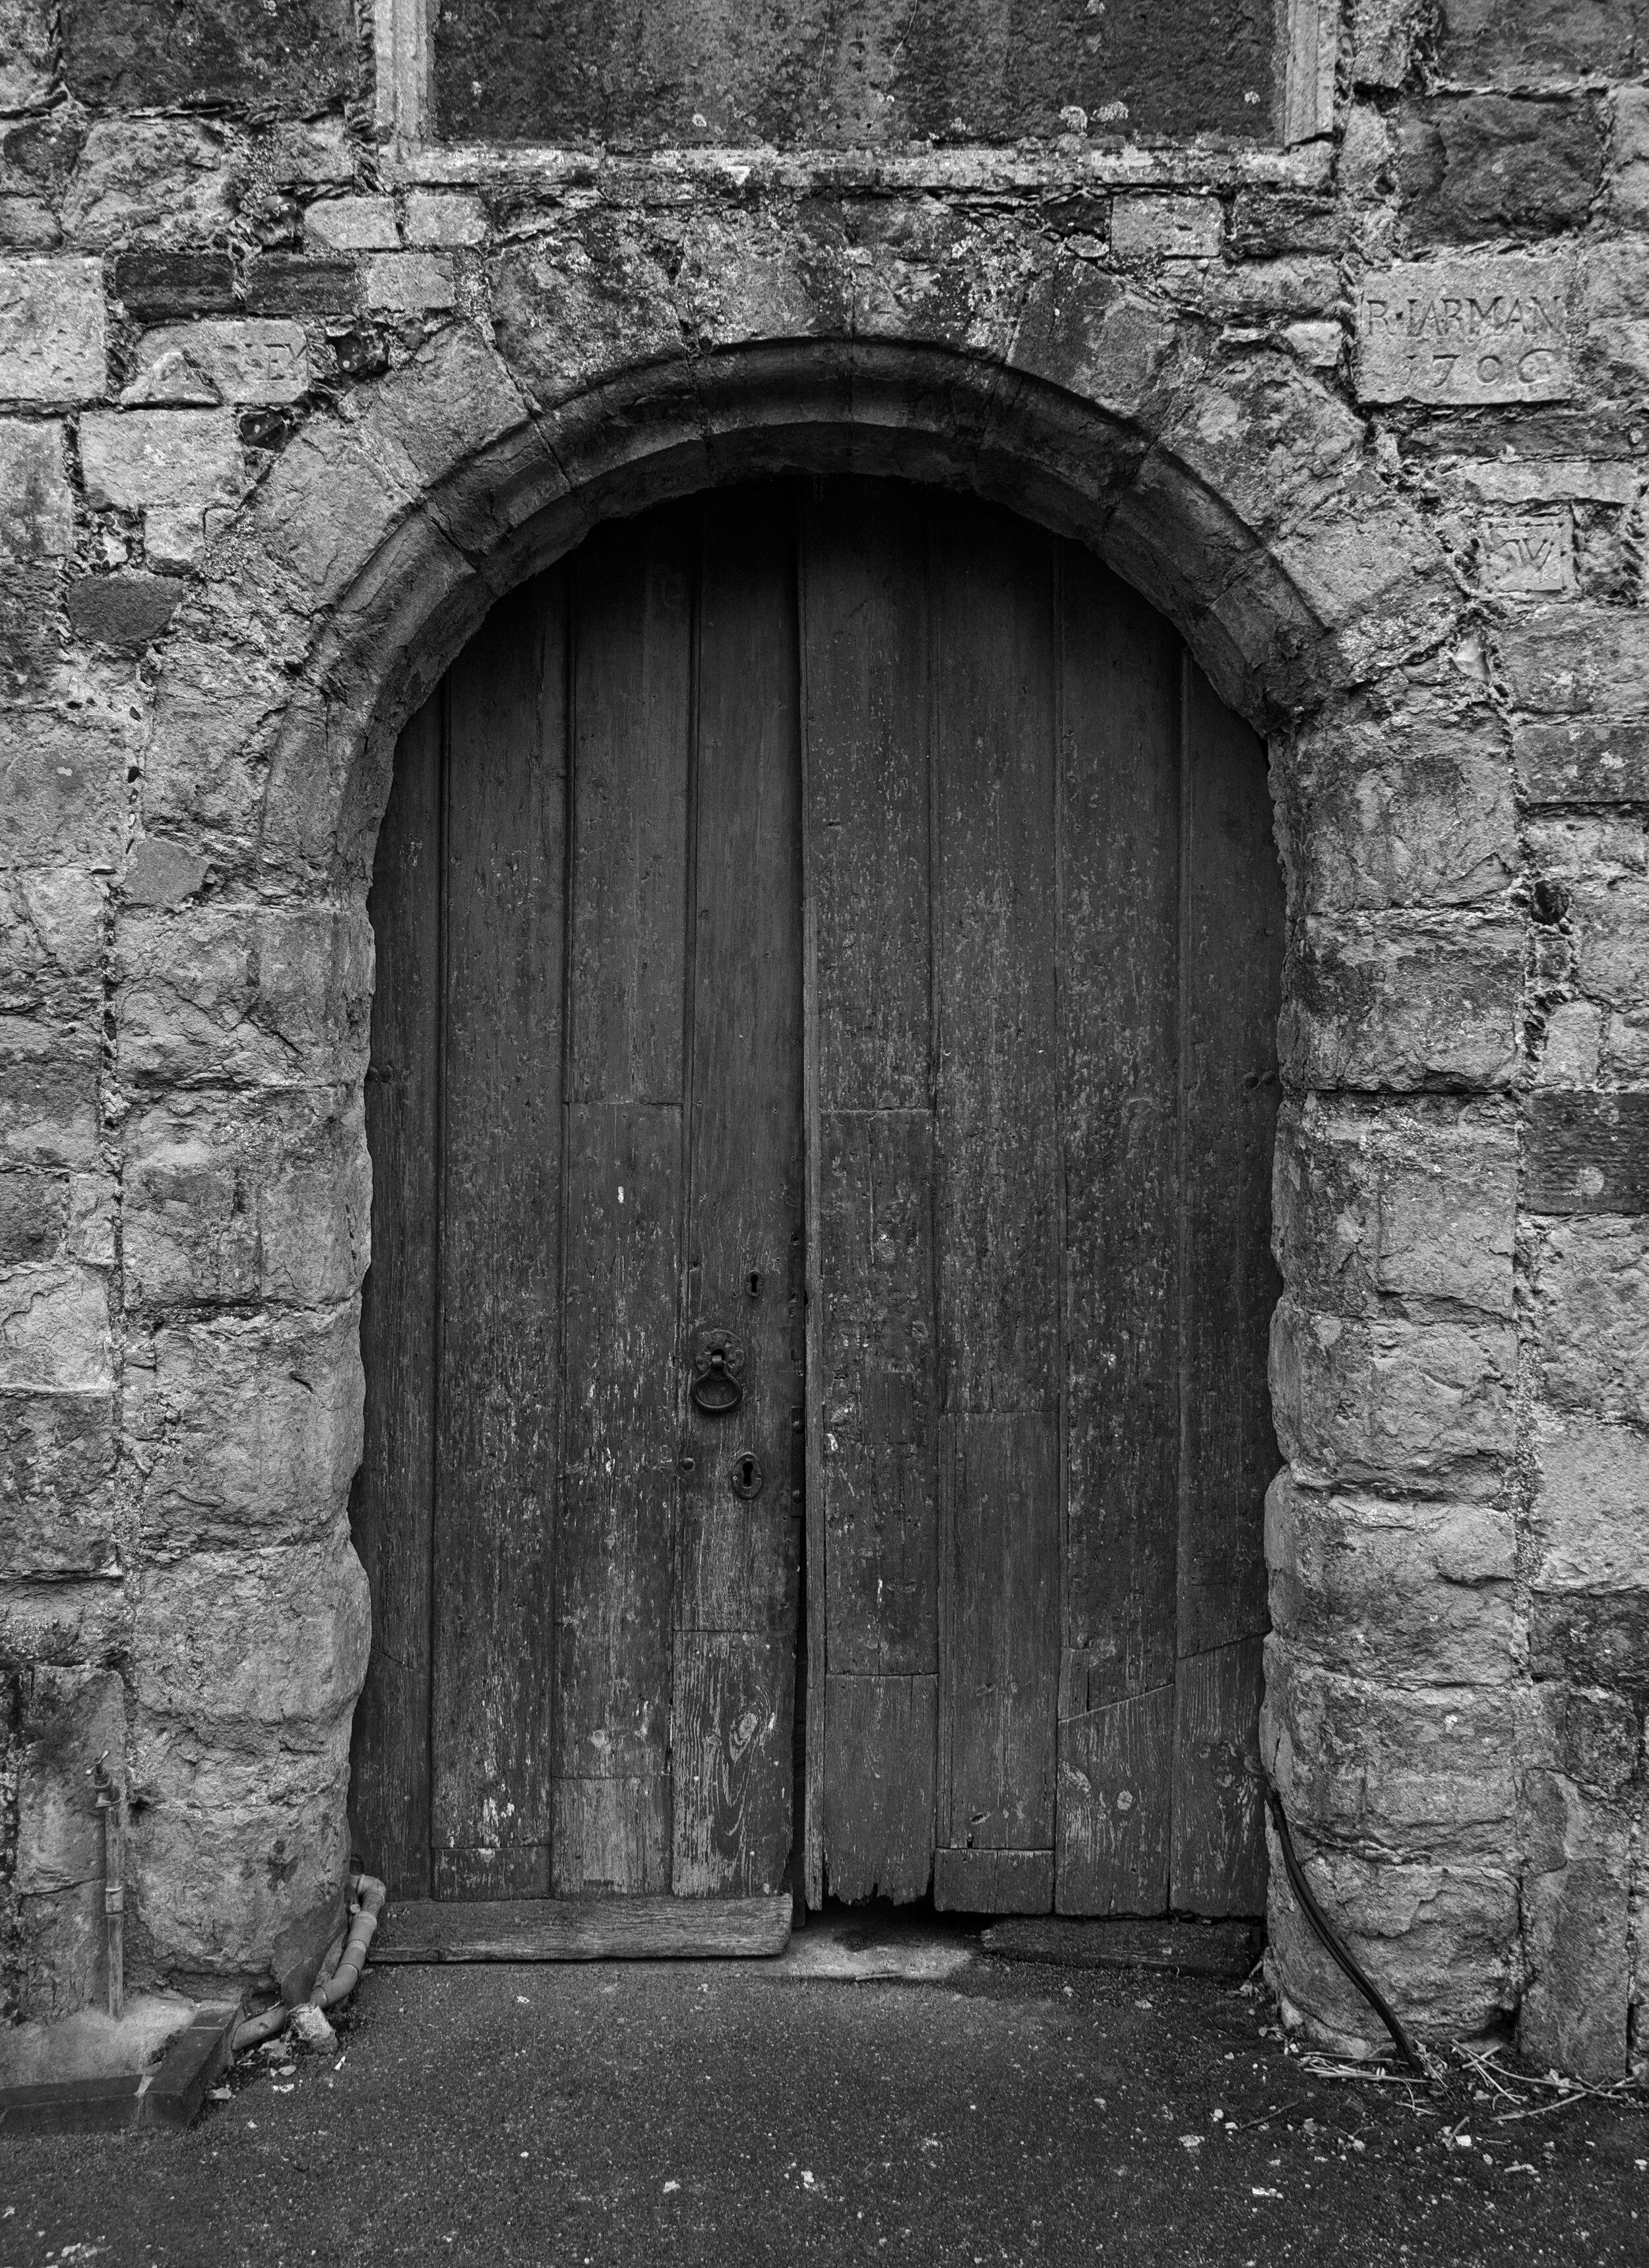 door-to-st-gregory--st-martins-church-wye_42837053300_o.jpg